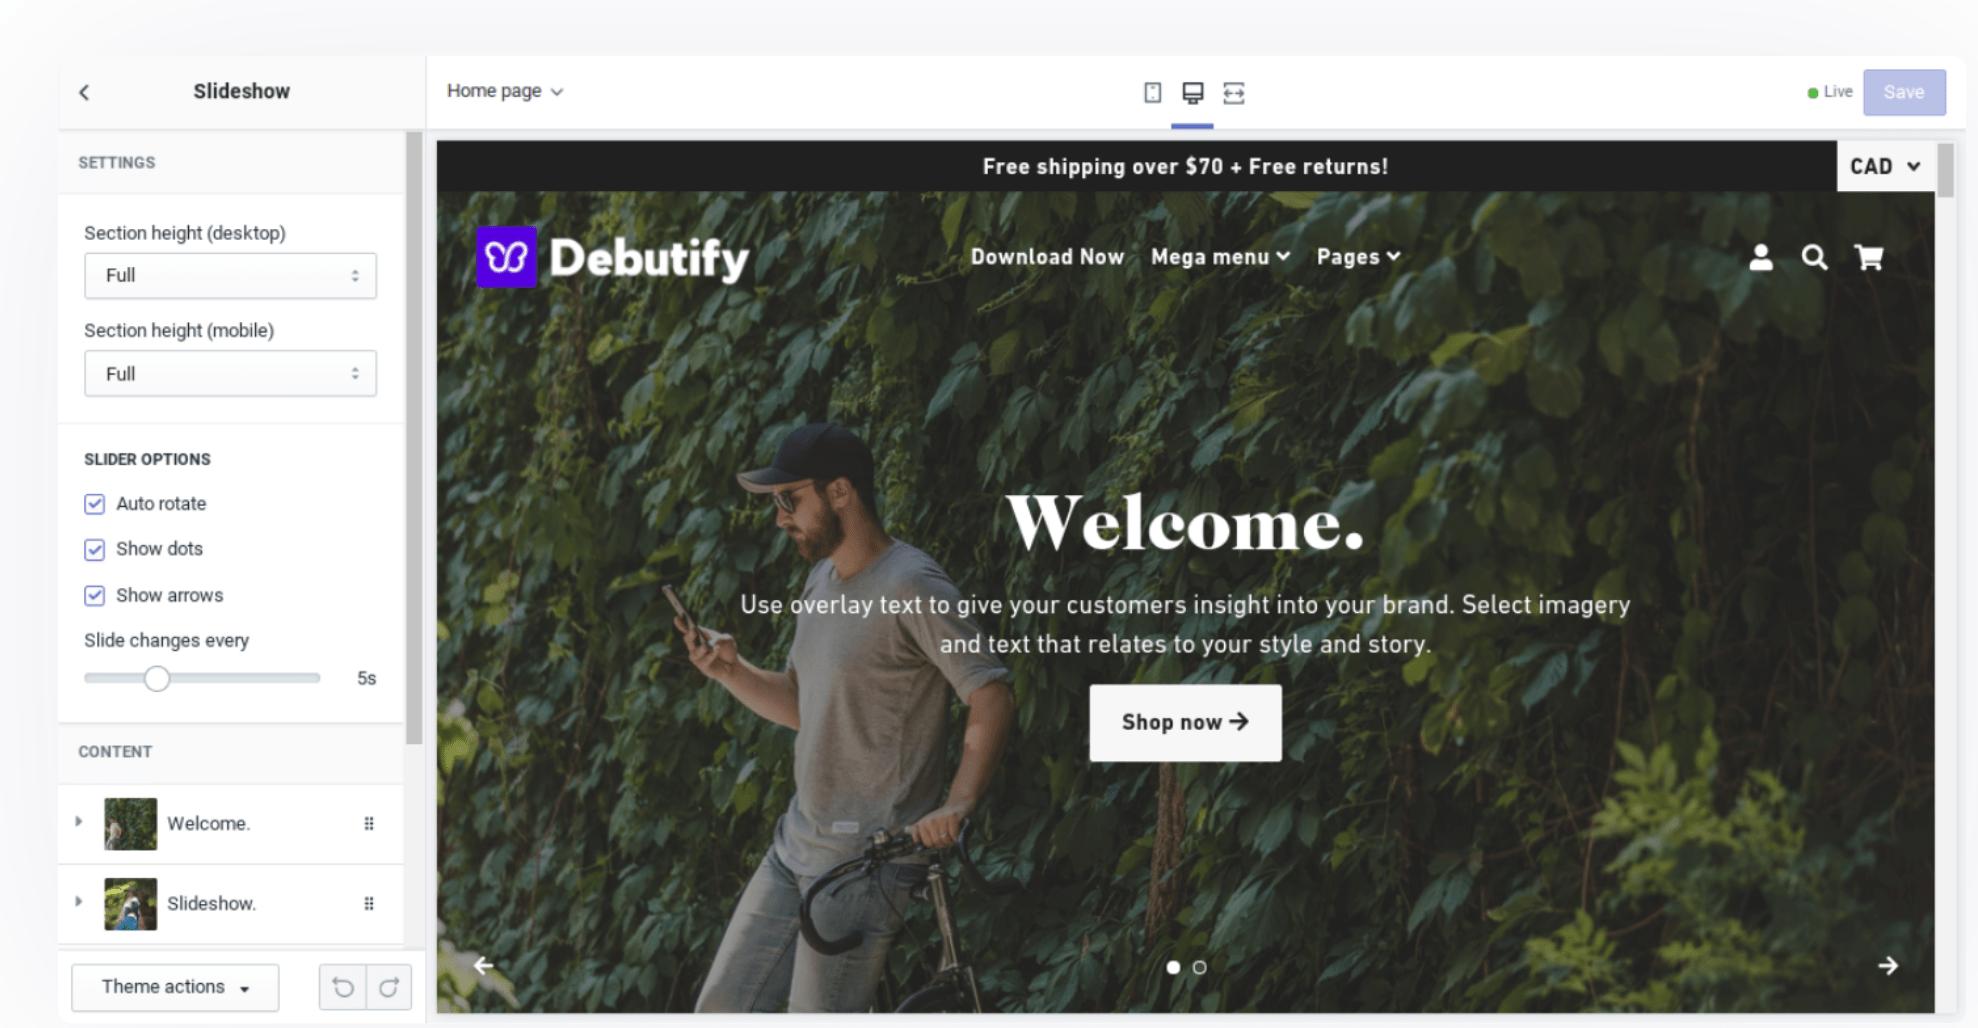 Debutify customize